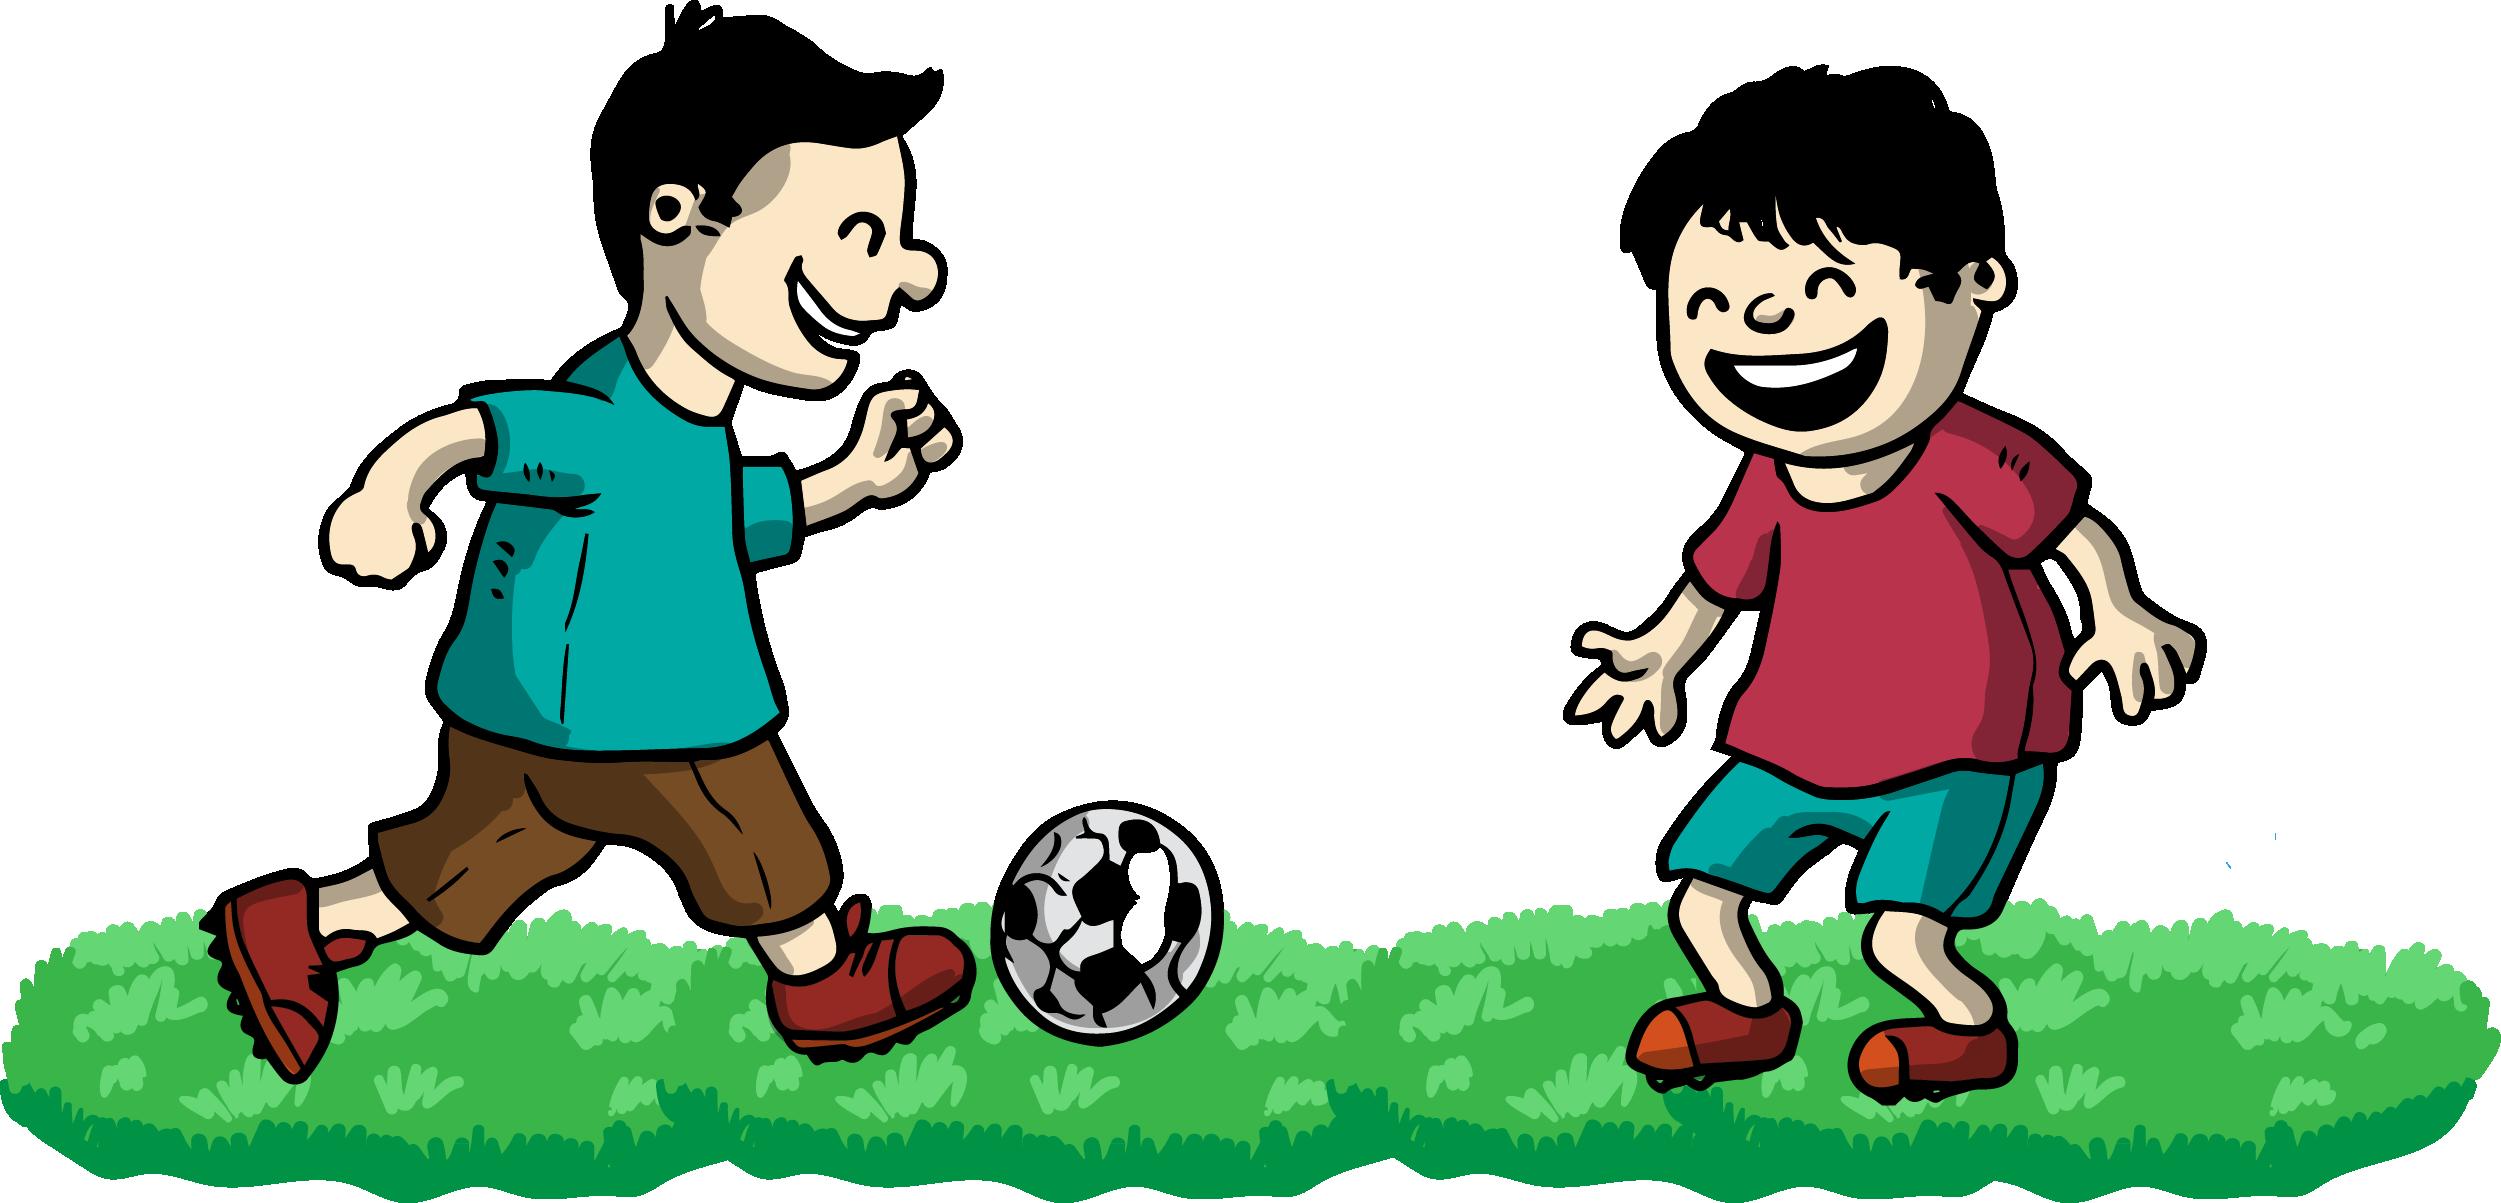 Art play clipart banner freeuse stock Download Clip Art Stock Football Clip Art Play Transprent Png - Play ... banner freeuse stock